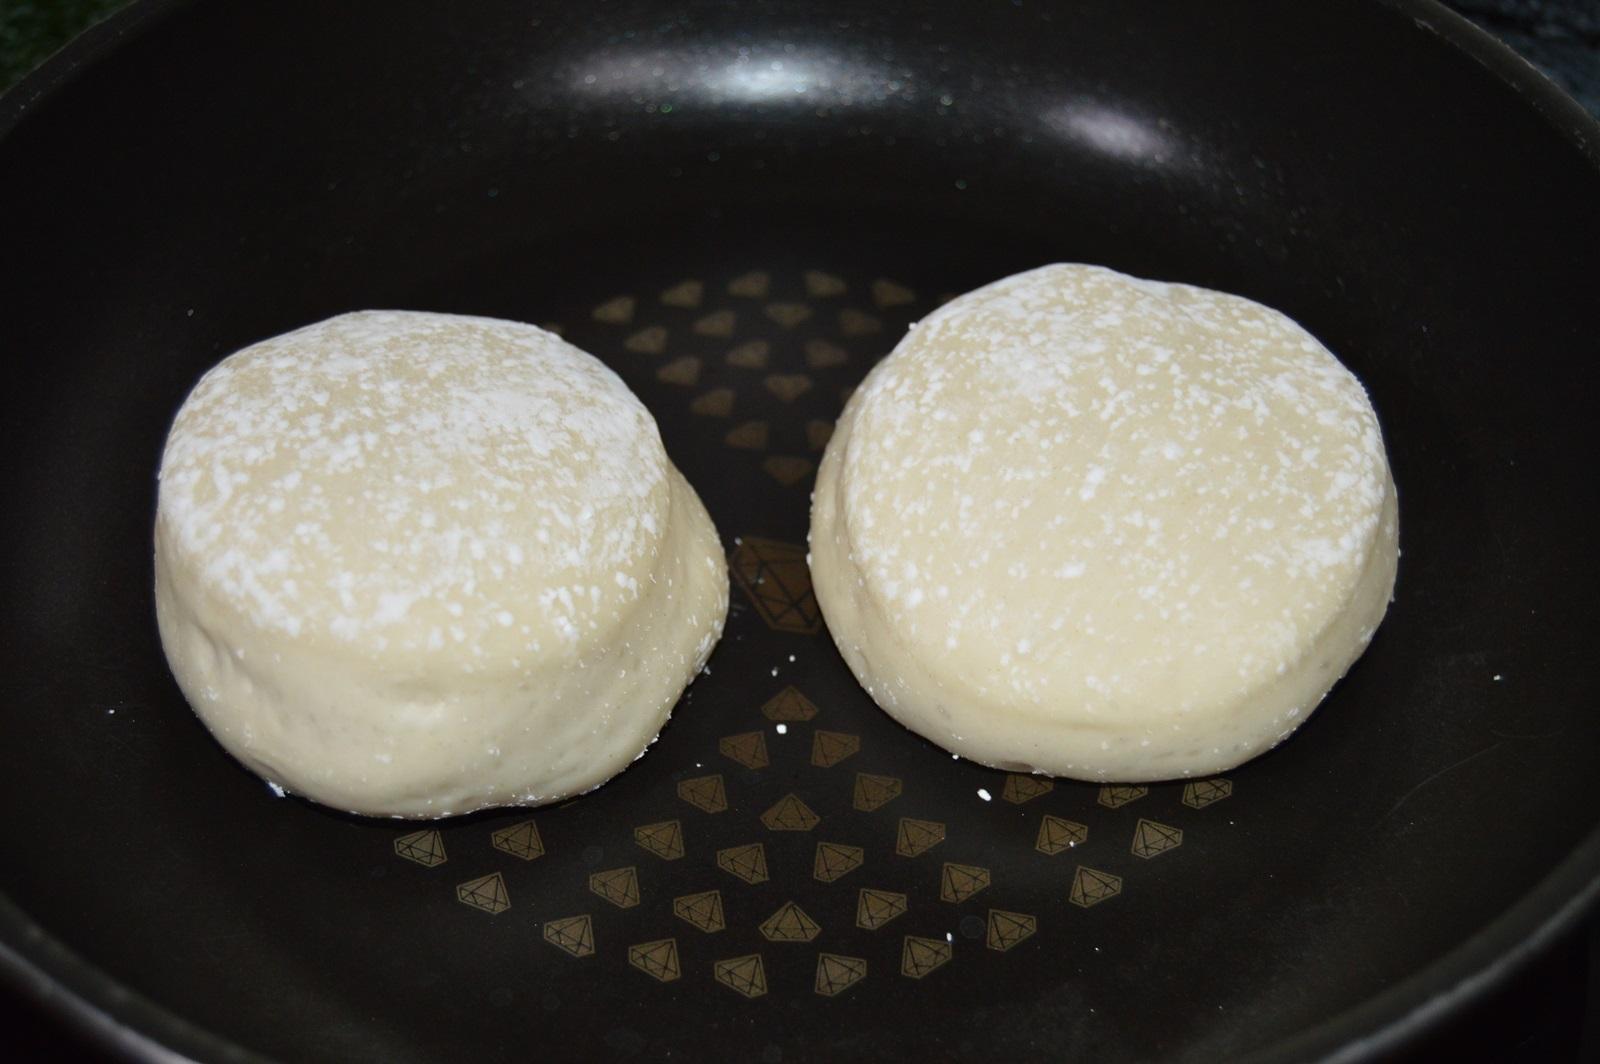 Masa de muffins levada. Aroma de chocolate